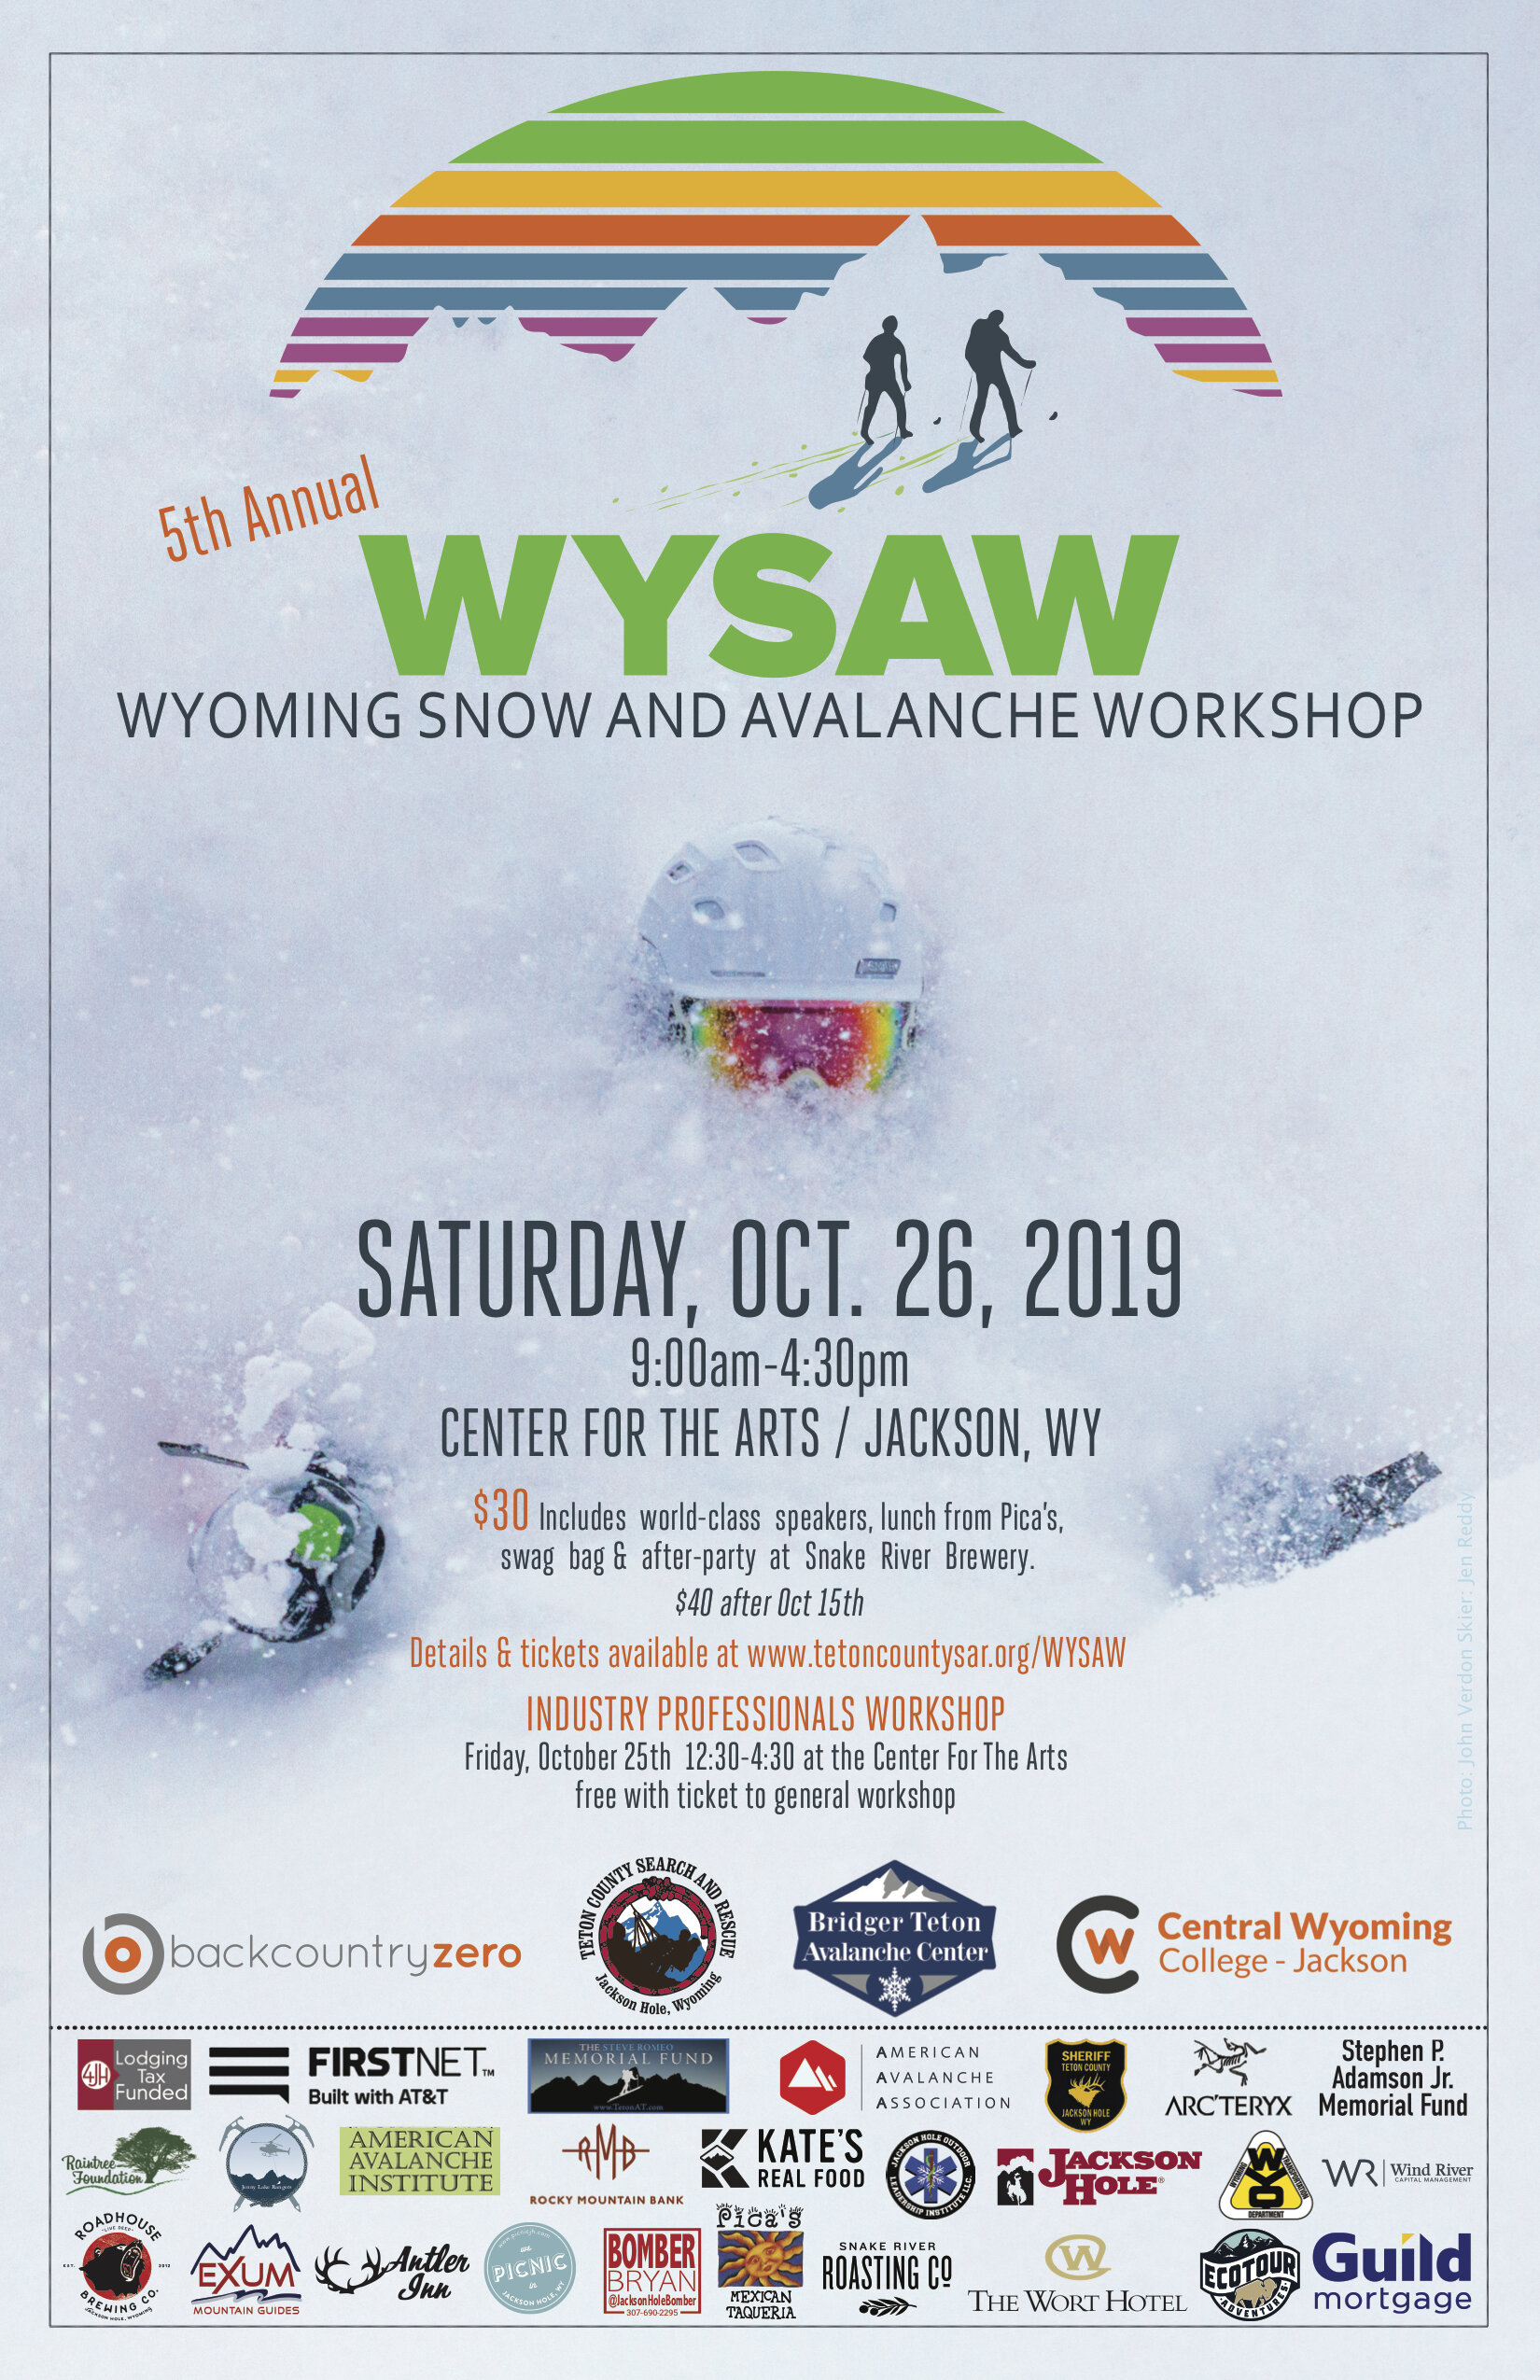 WYSAW_Poster_2019_final.jpg